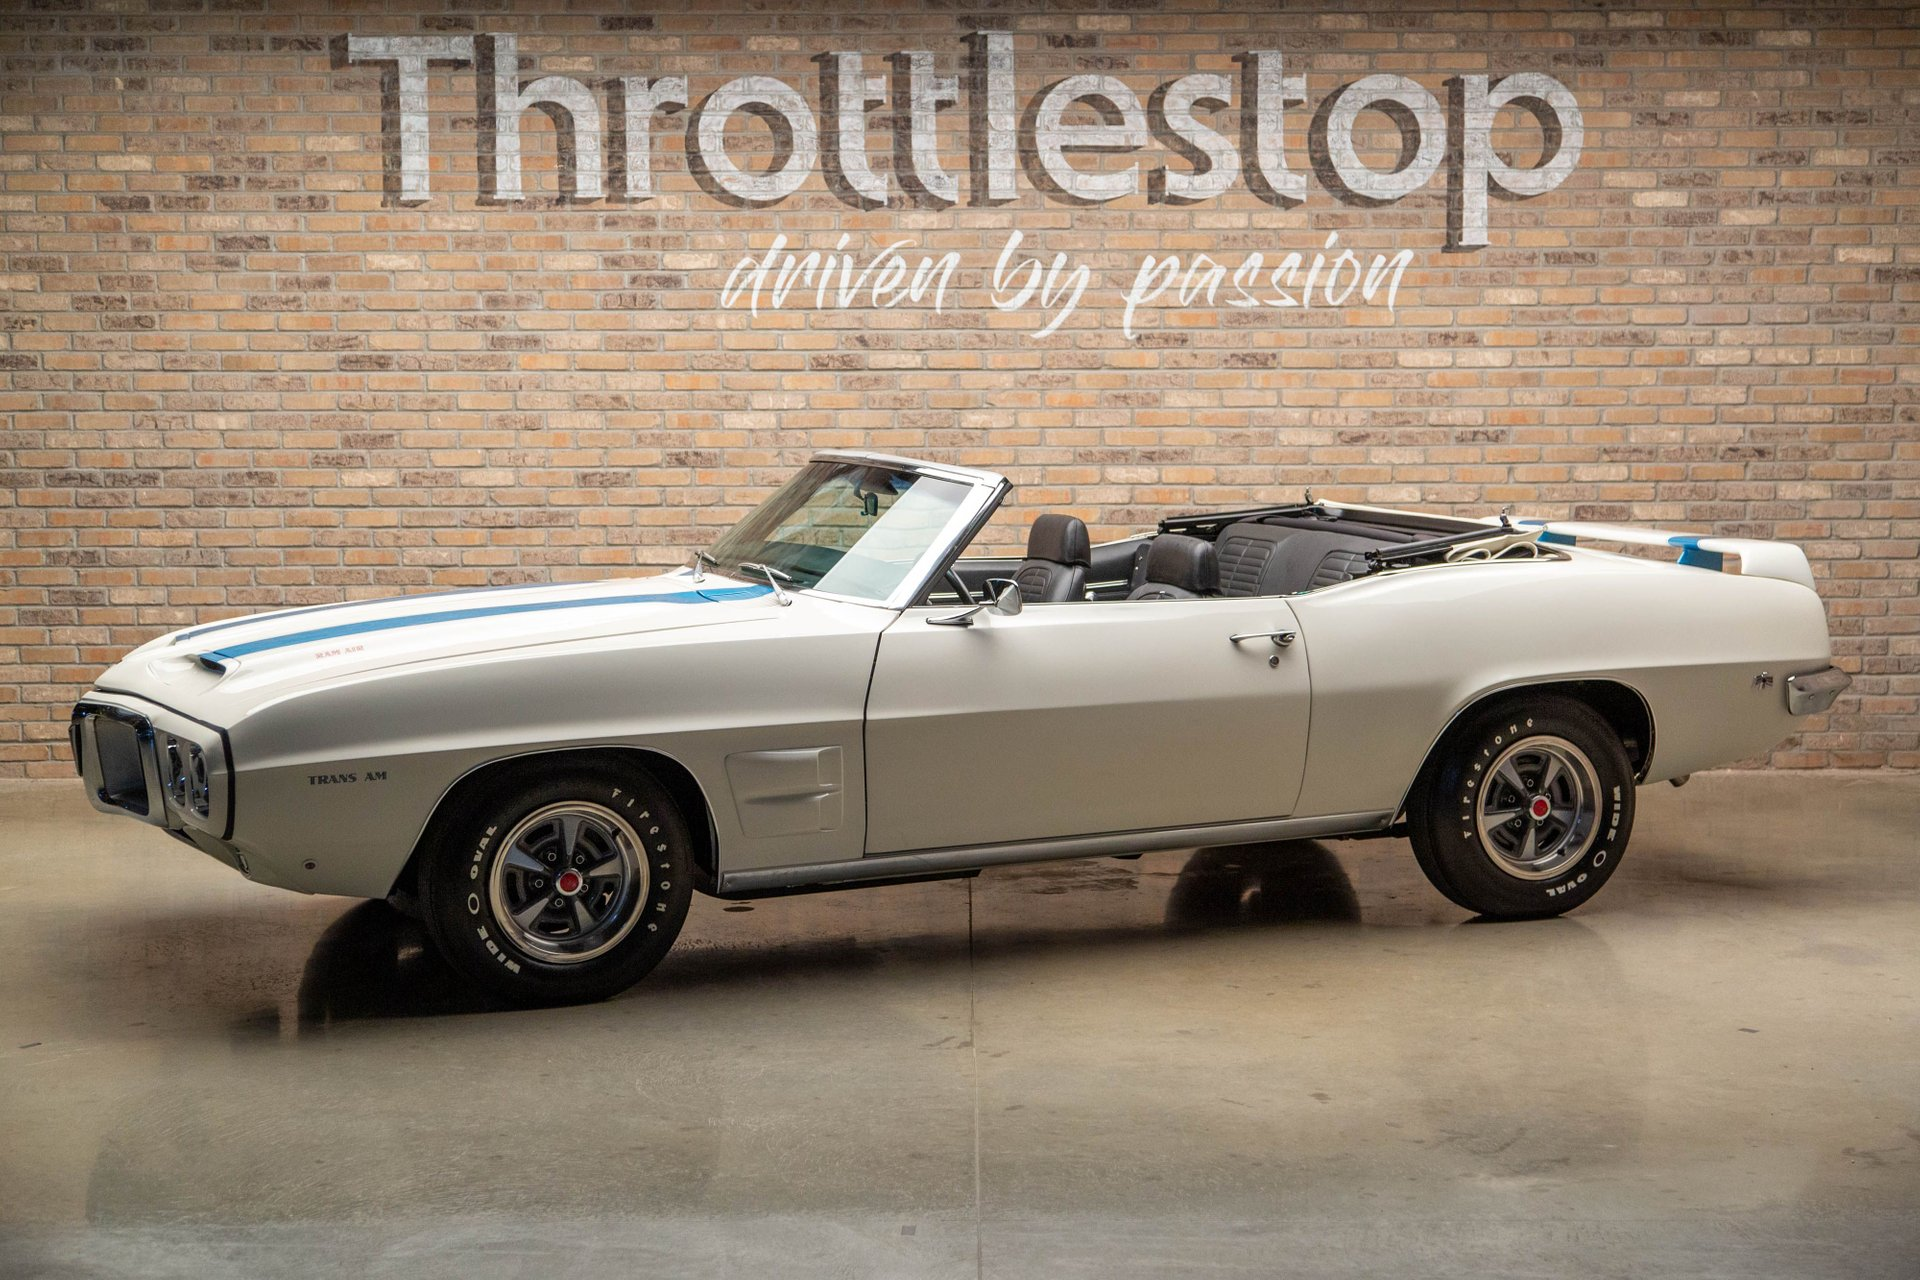 1969 pontiac trans am convertible recreation